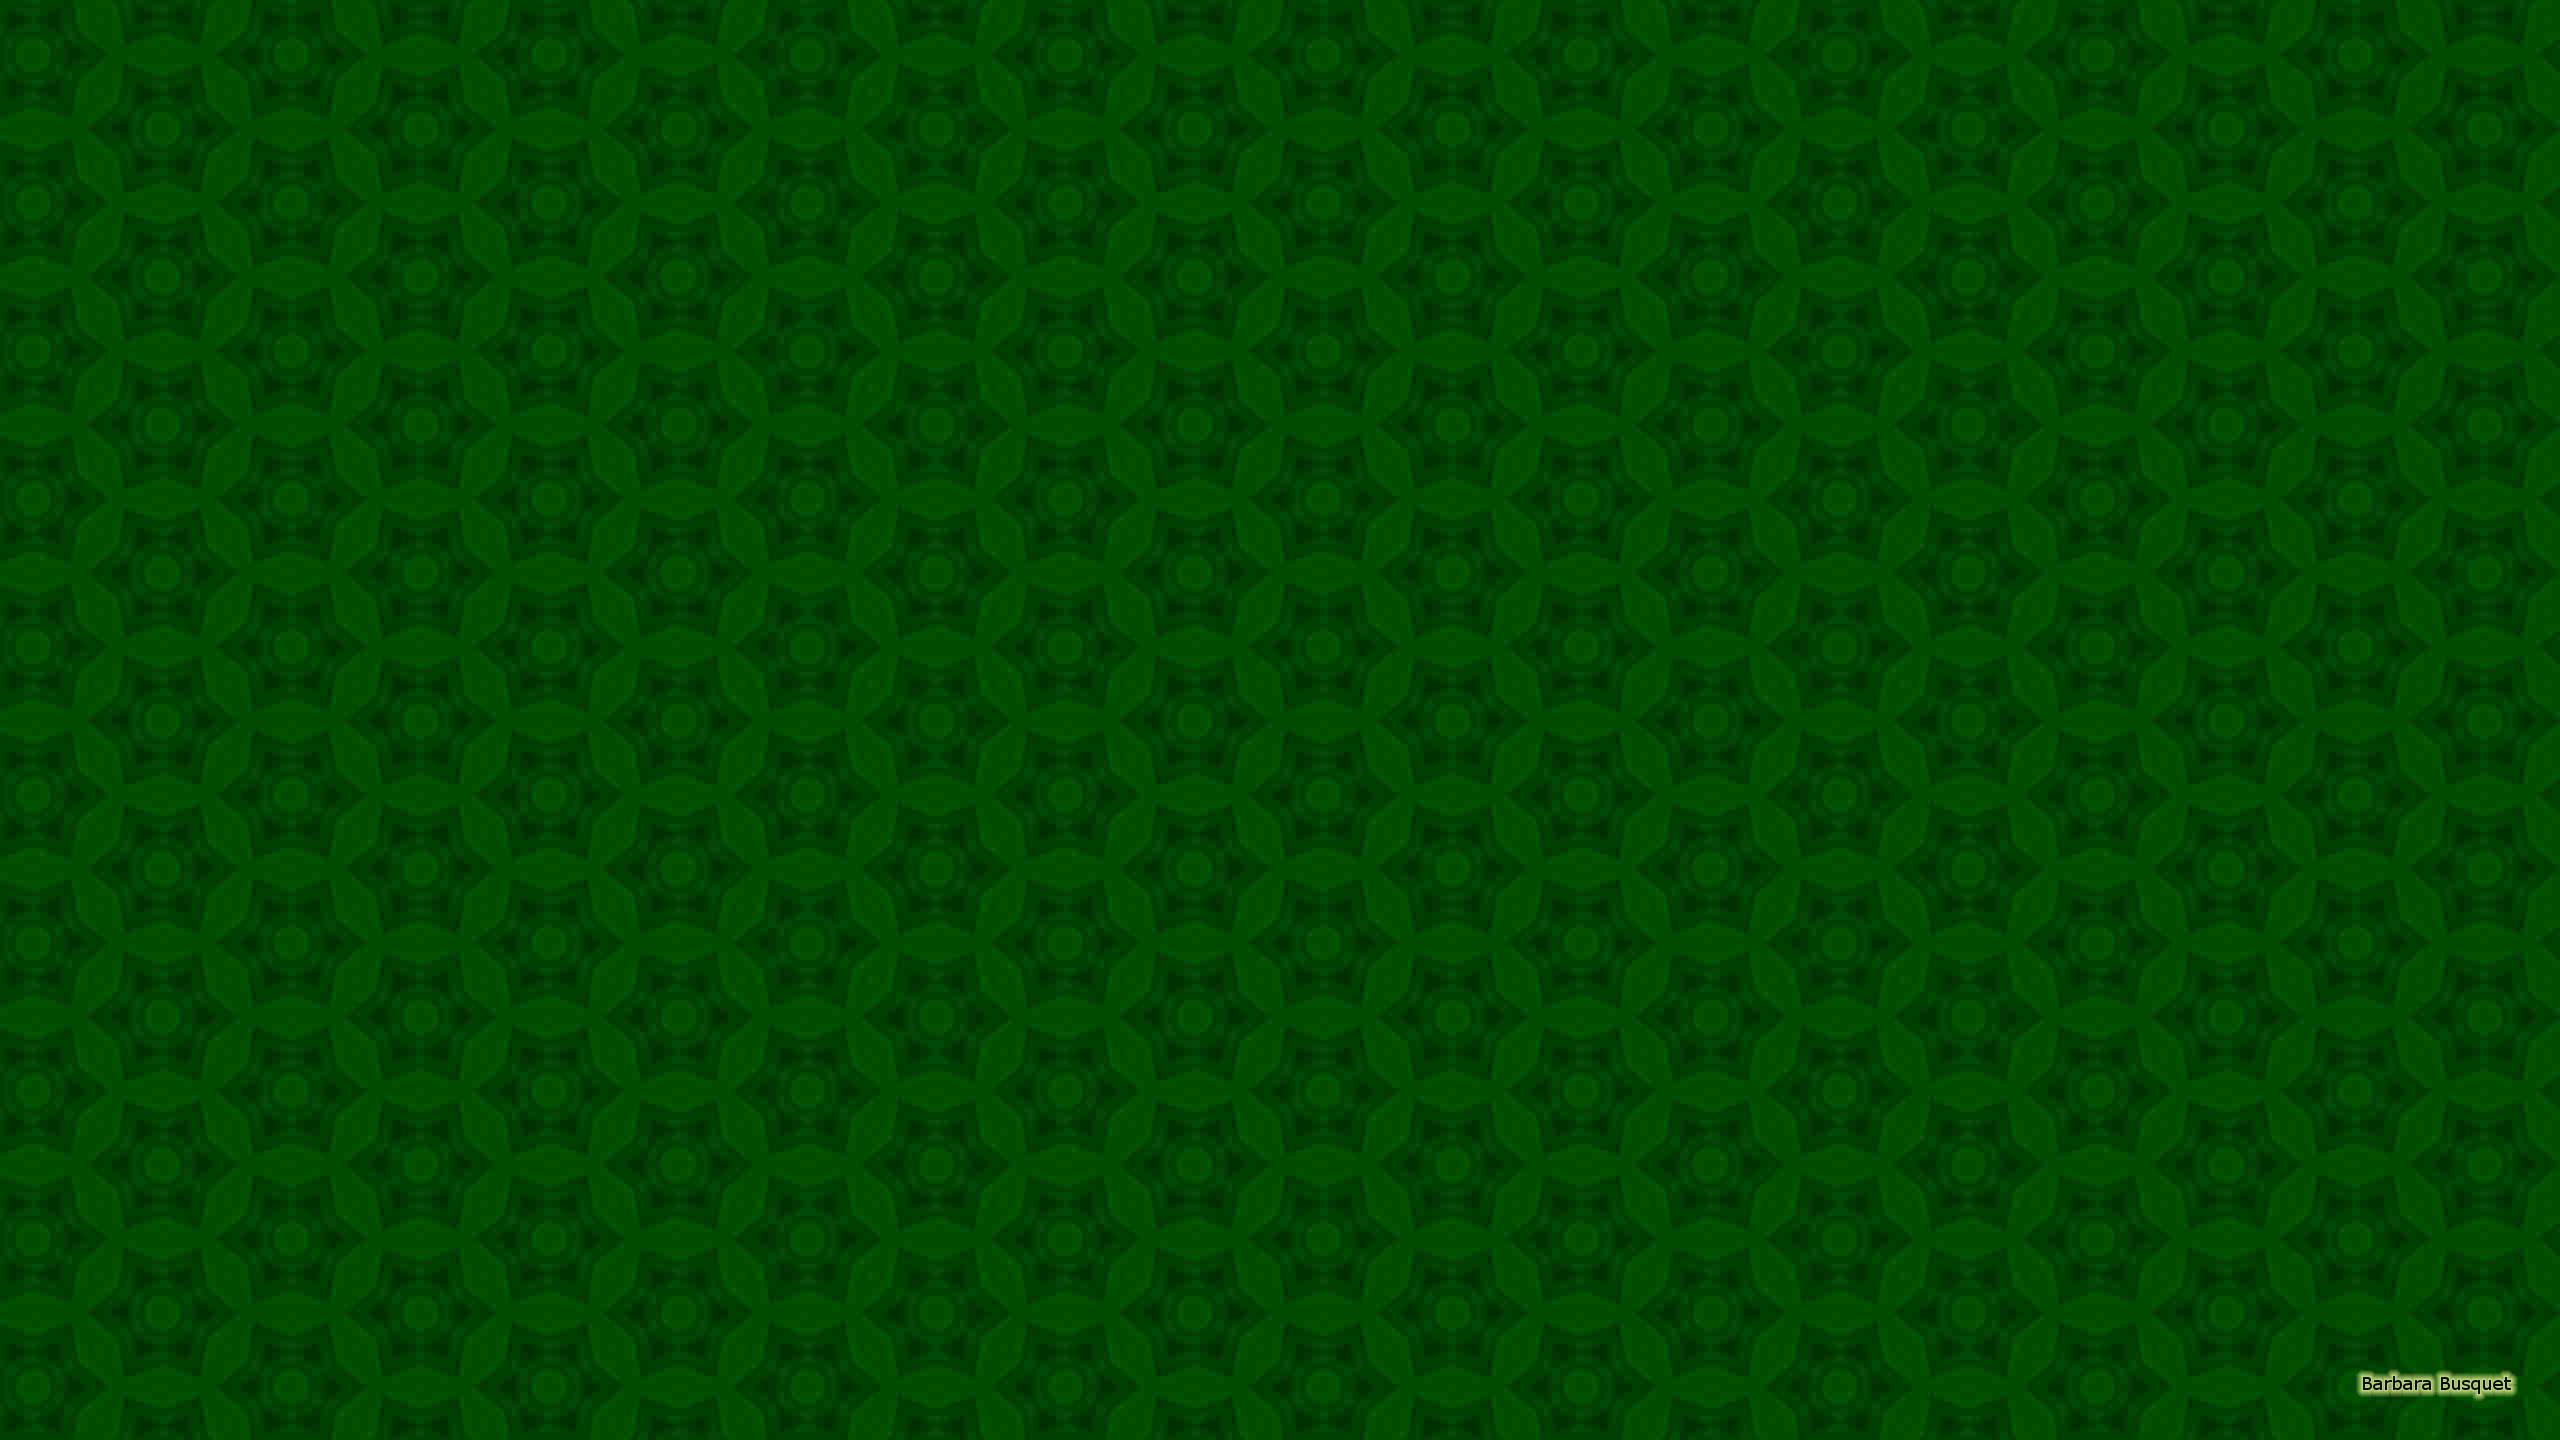 Dark Green Background Wallpaper: Barbaras HD Wallpapers